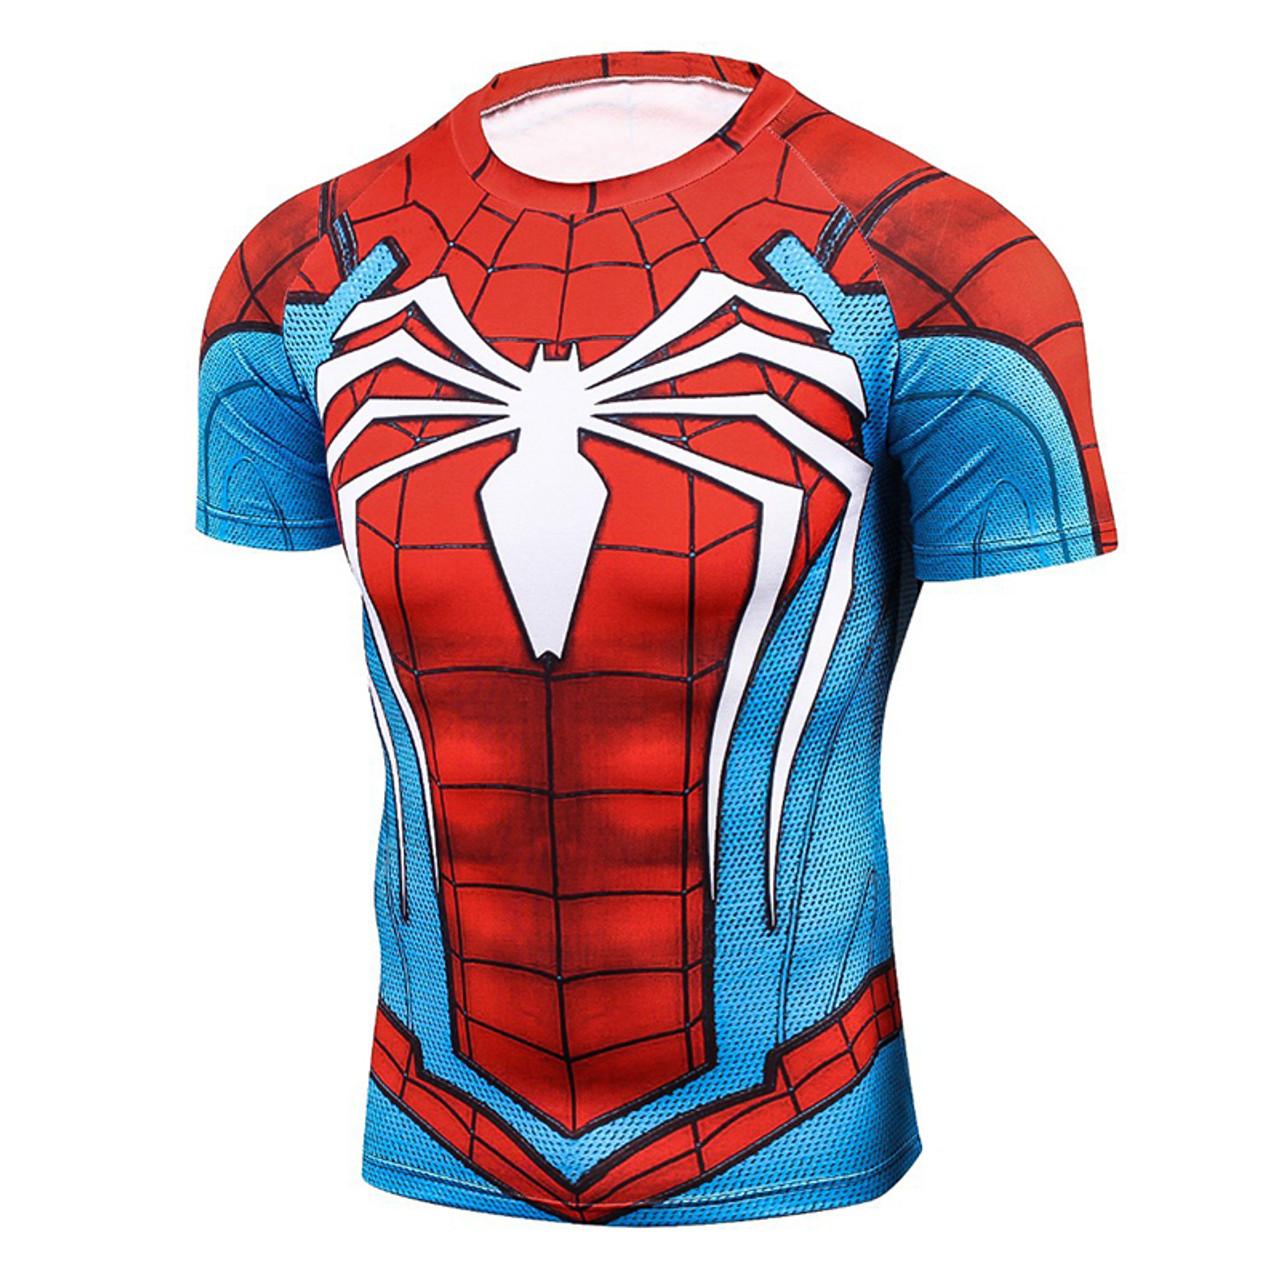 bb6c0dbfa ... YFFUSHI 2018 Hot Sale Men hoodies Fashion men Spiderman 3d print  Hoodies Streetwear Casual Cospaly Sweatshirt ...